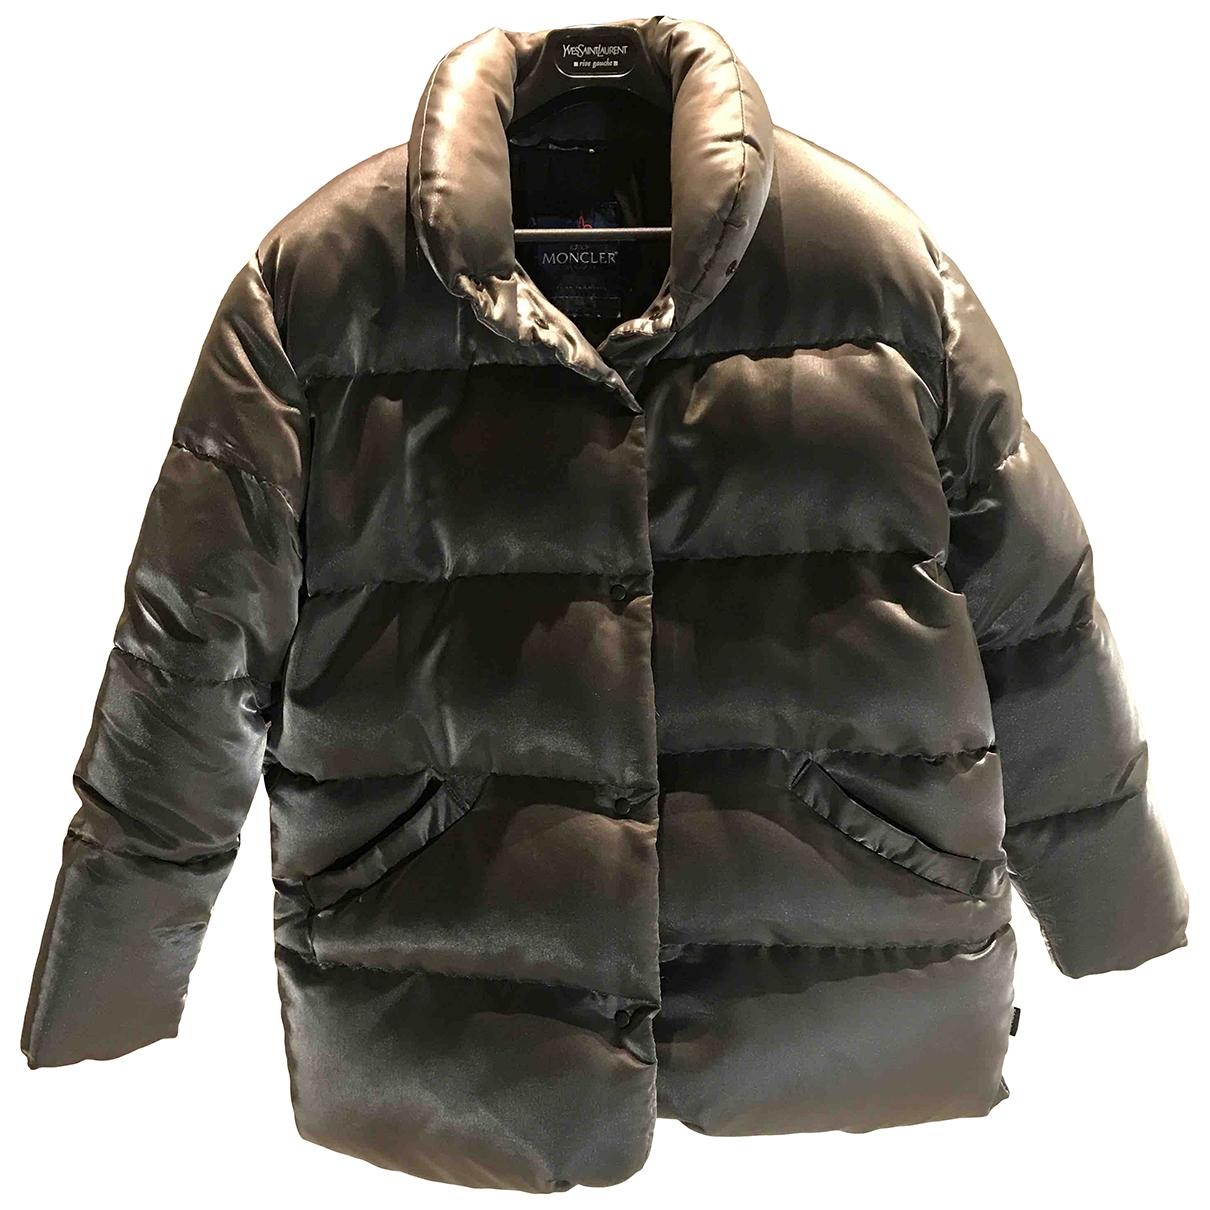 Moncler Grenoble Jacke in Polyester